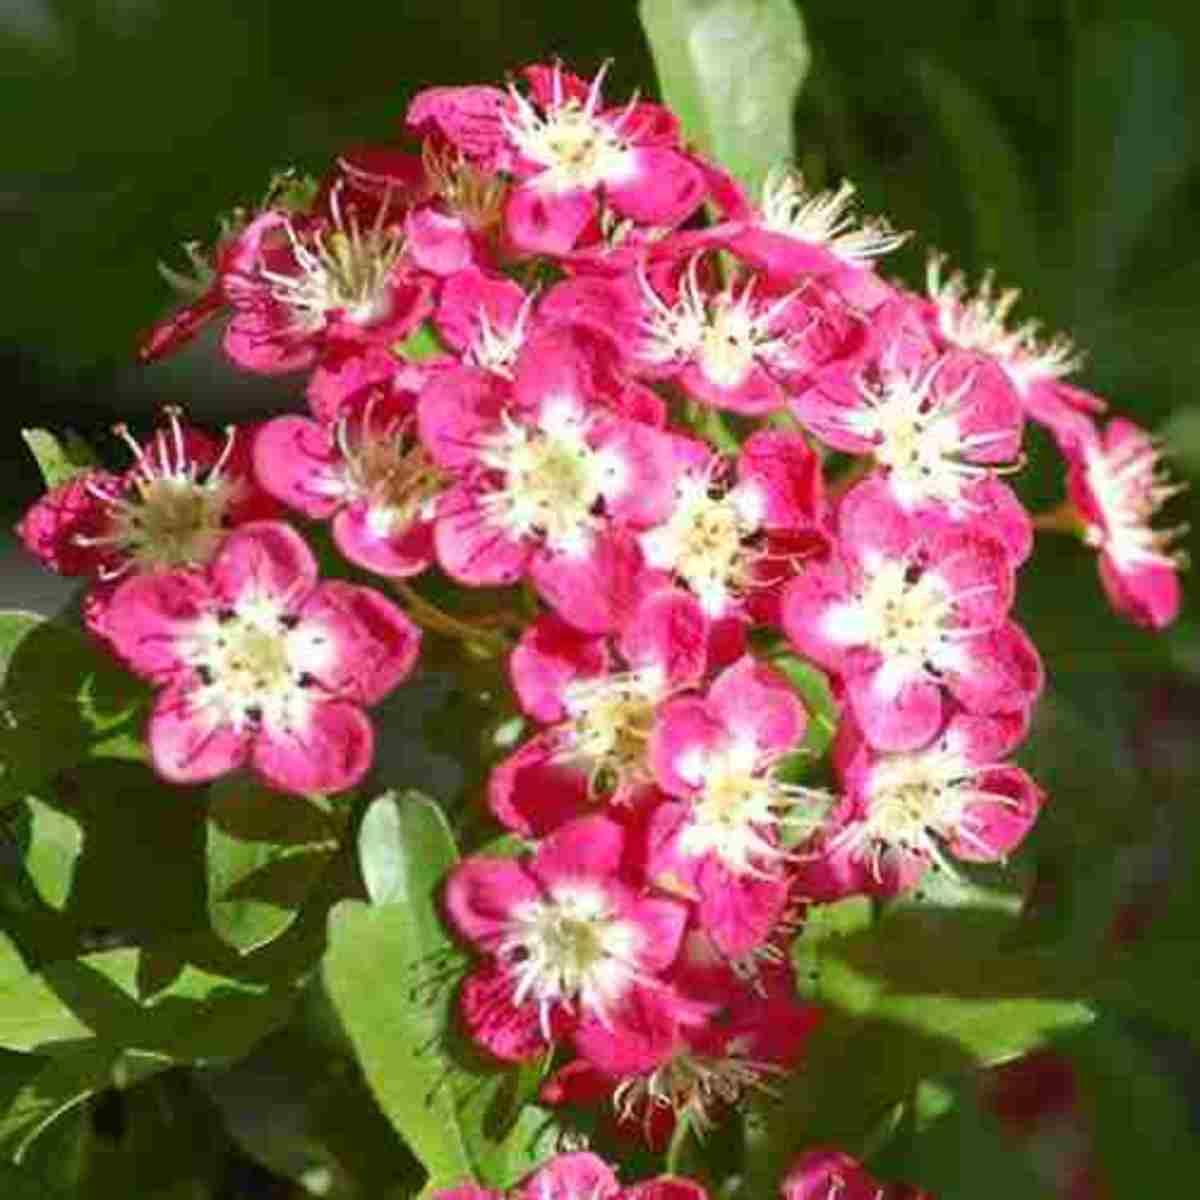 Hawthorn (Crataegus) One of the Wise Womans healing plants. Public Domain